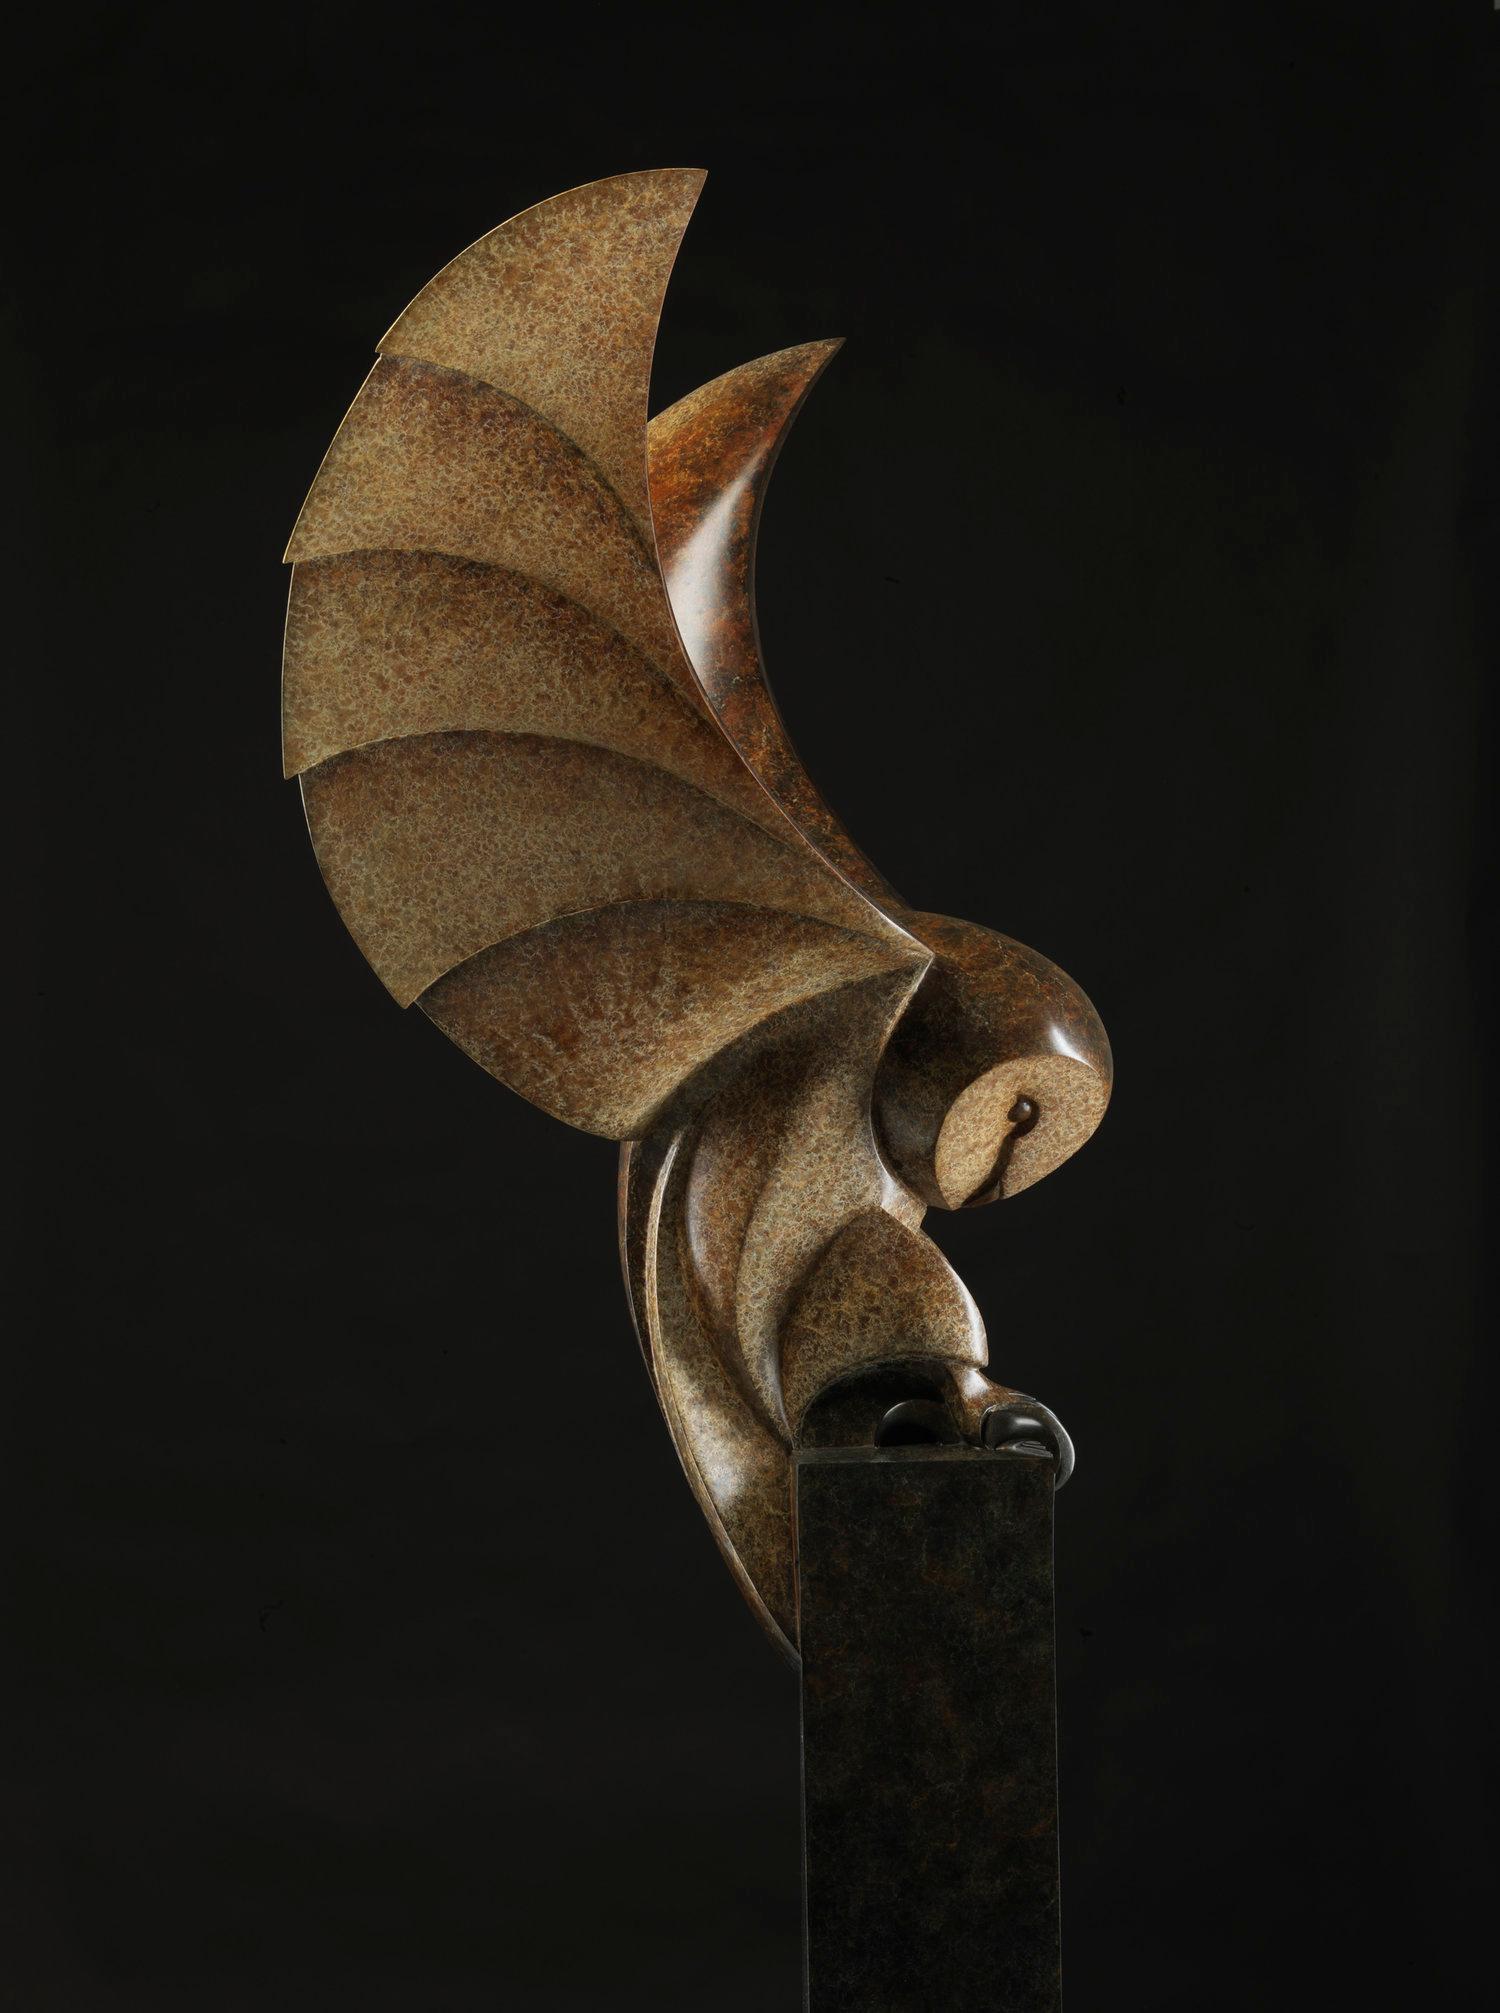 Barn Owl, Cast Bronze Sculpture by British artist Paul Harvey